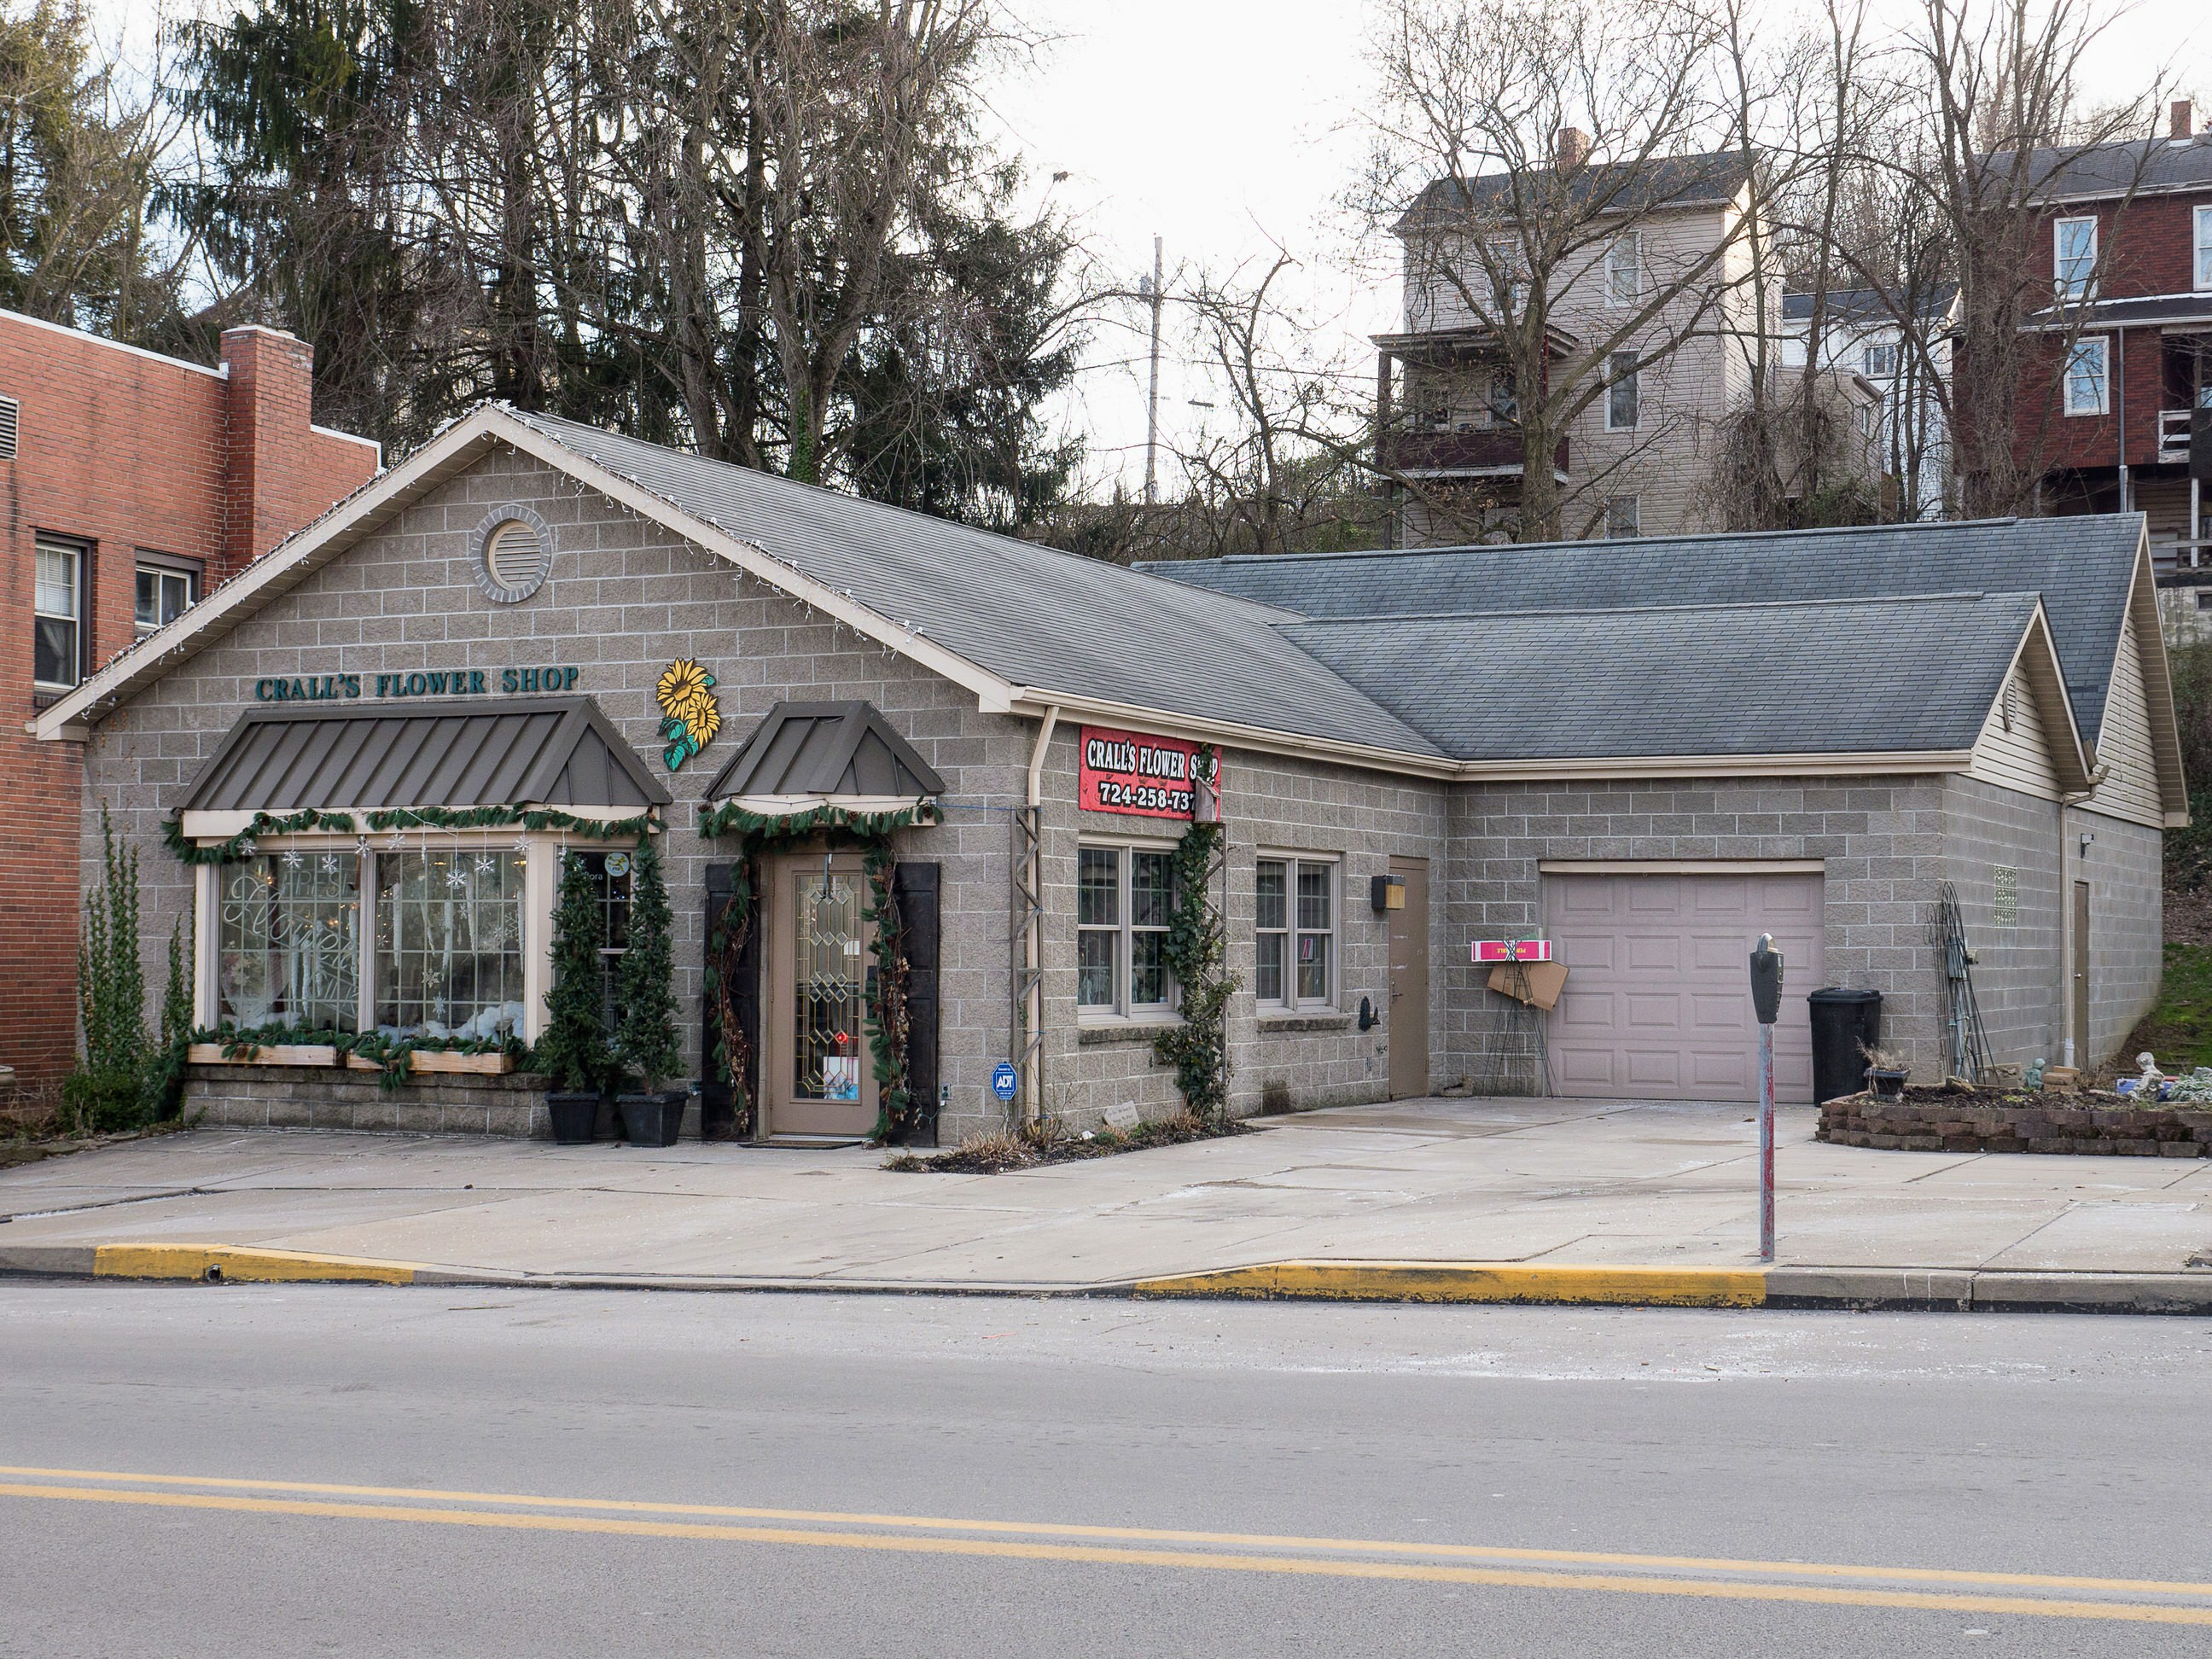 Photo of building at 120 West Main Street, Monongahela, Pa. 15063 along rt 88 and rt 136. Photo property of the Monongahela Main Street Program.